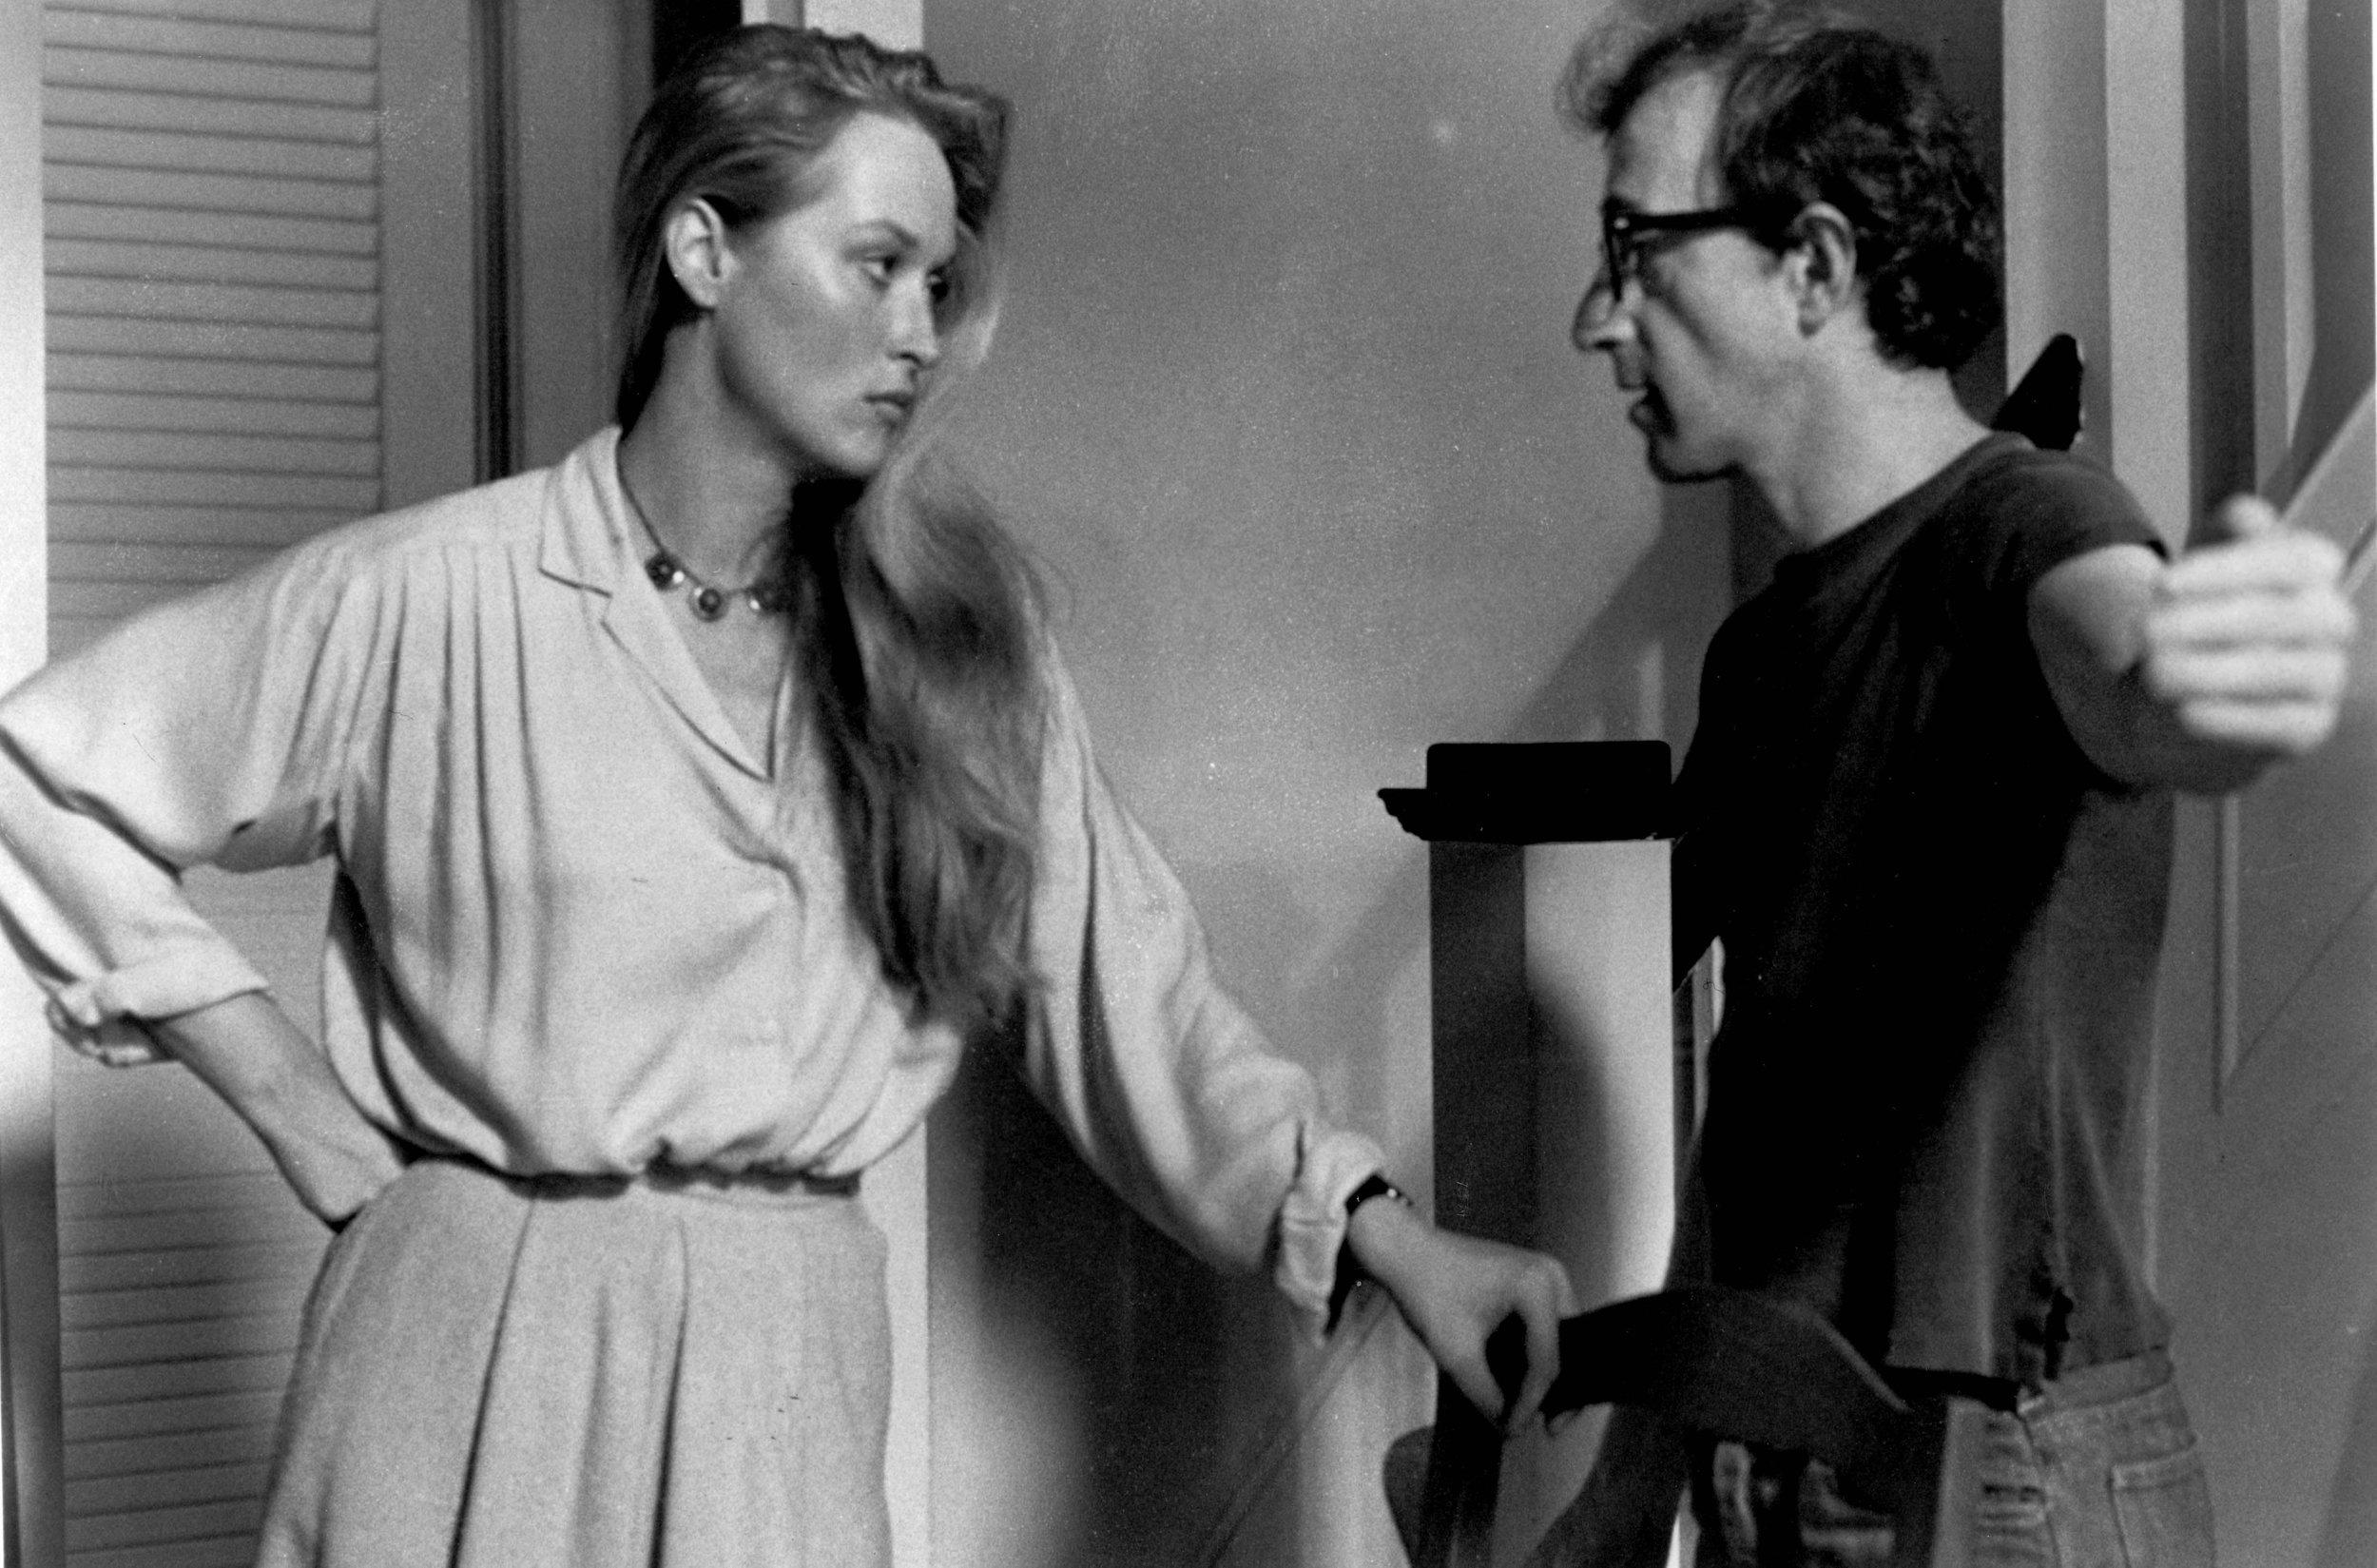 Meryl and Woody Allen in the 1979 film Manhattan